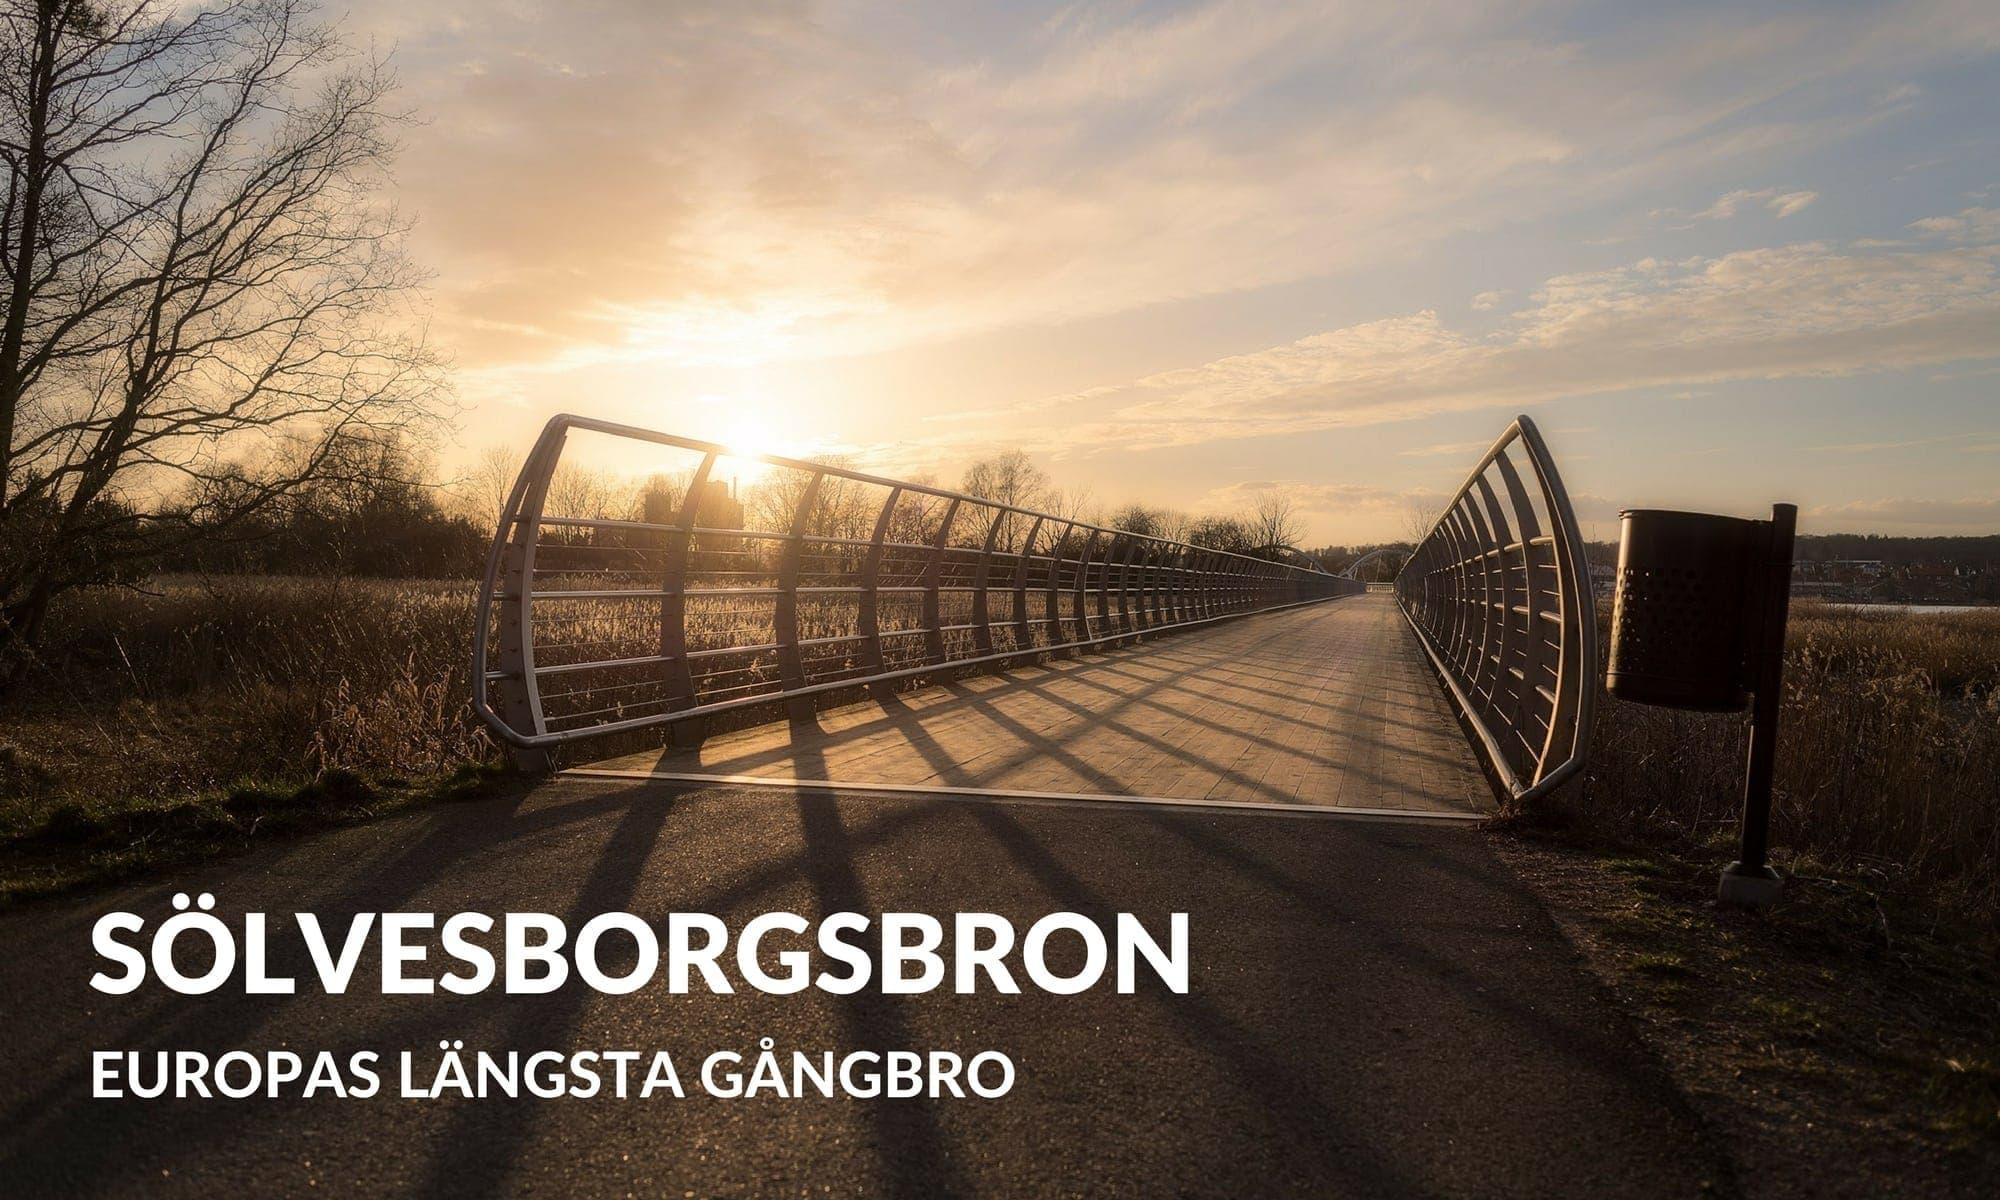 Sölvesborgsbron - Europas längsta gångbro - Ludwig Sörmlind